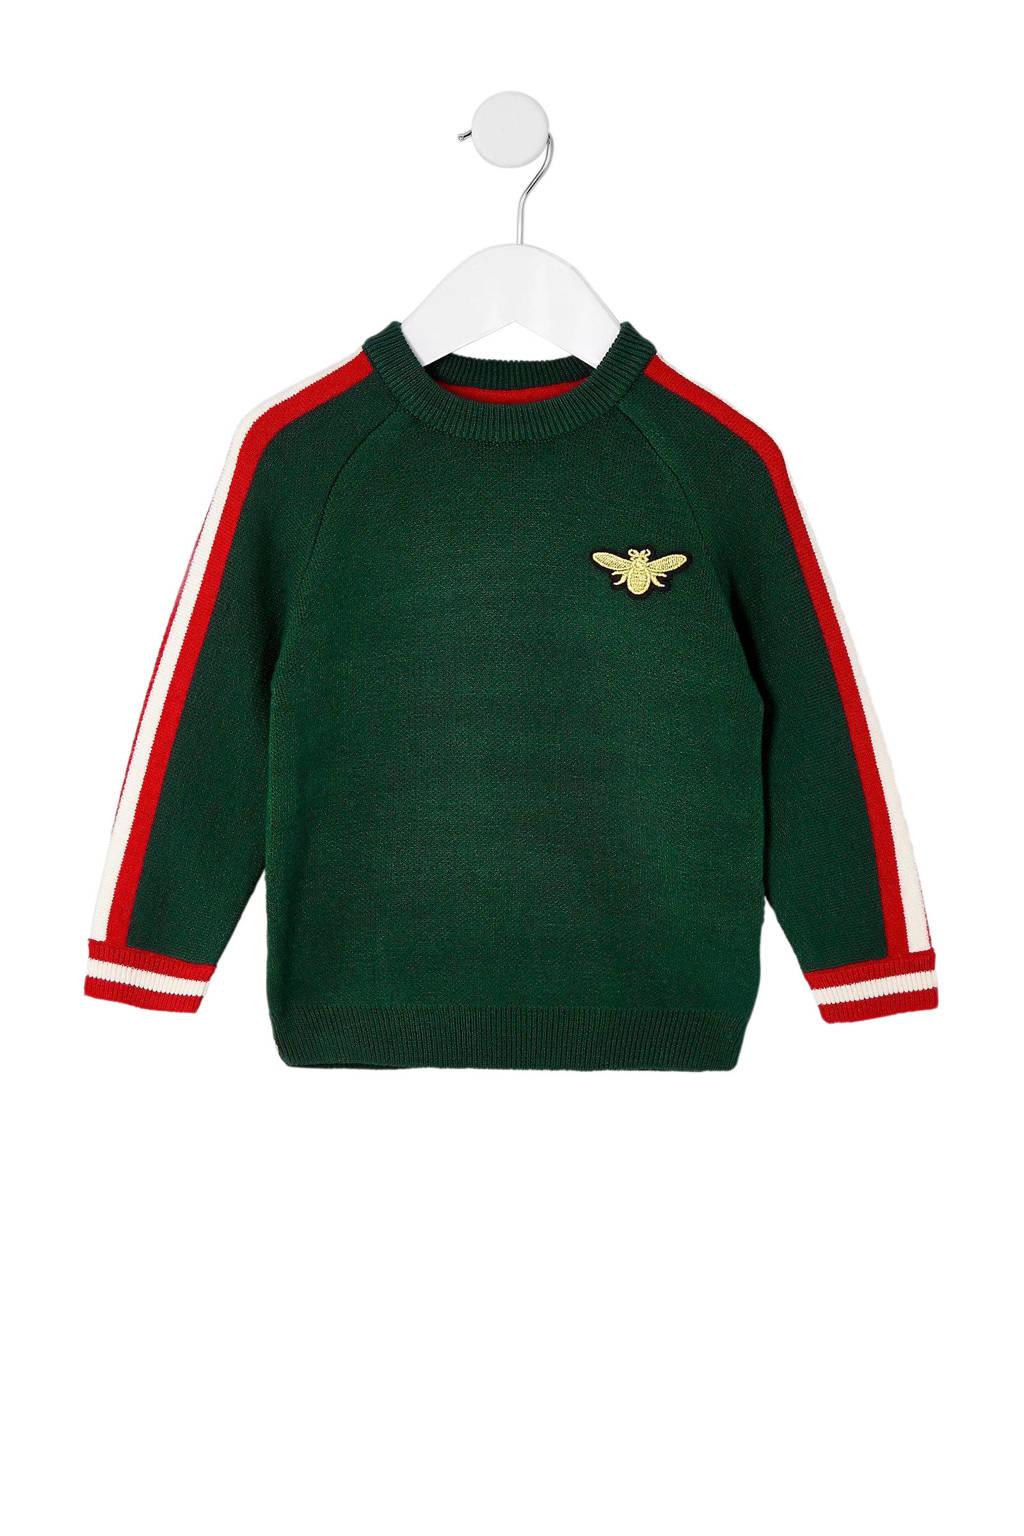 River Island sweater met streep, Groen/Rood/Wit